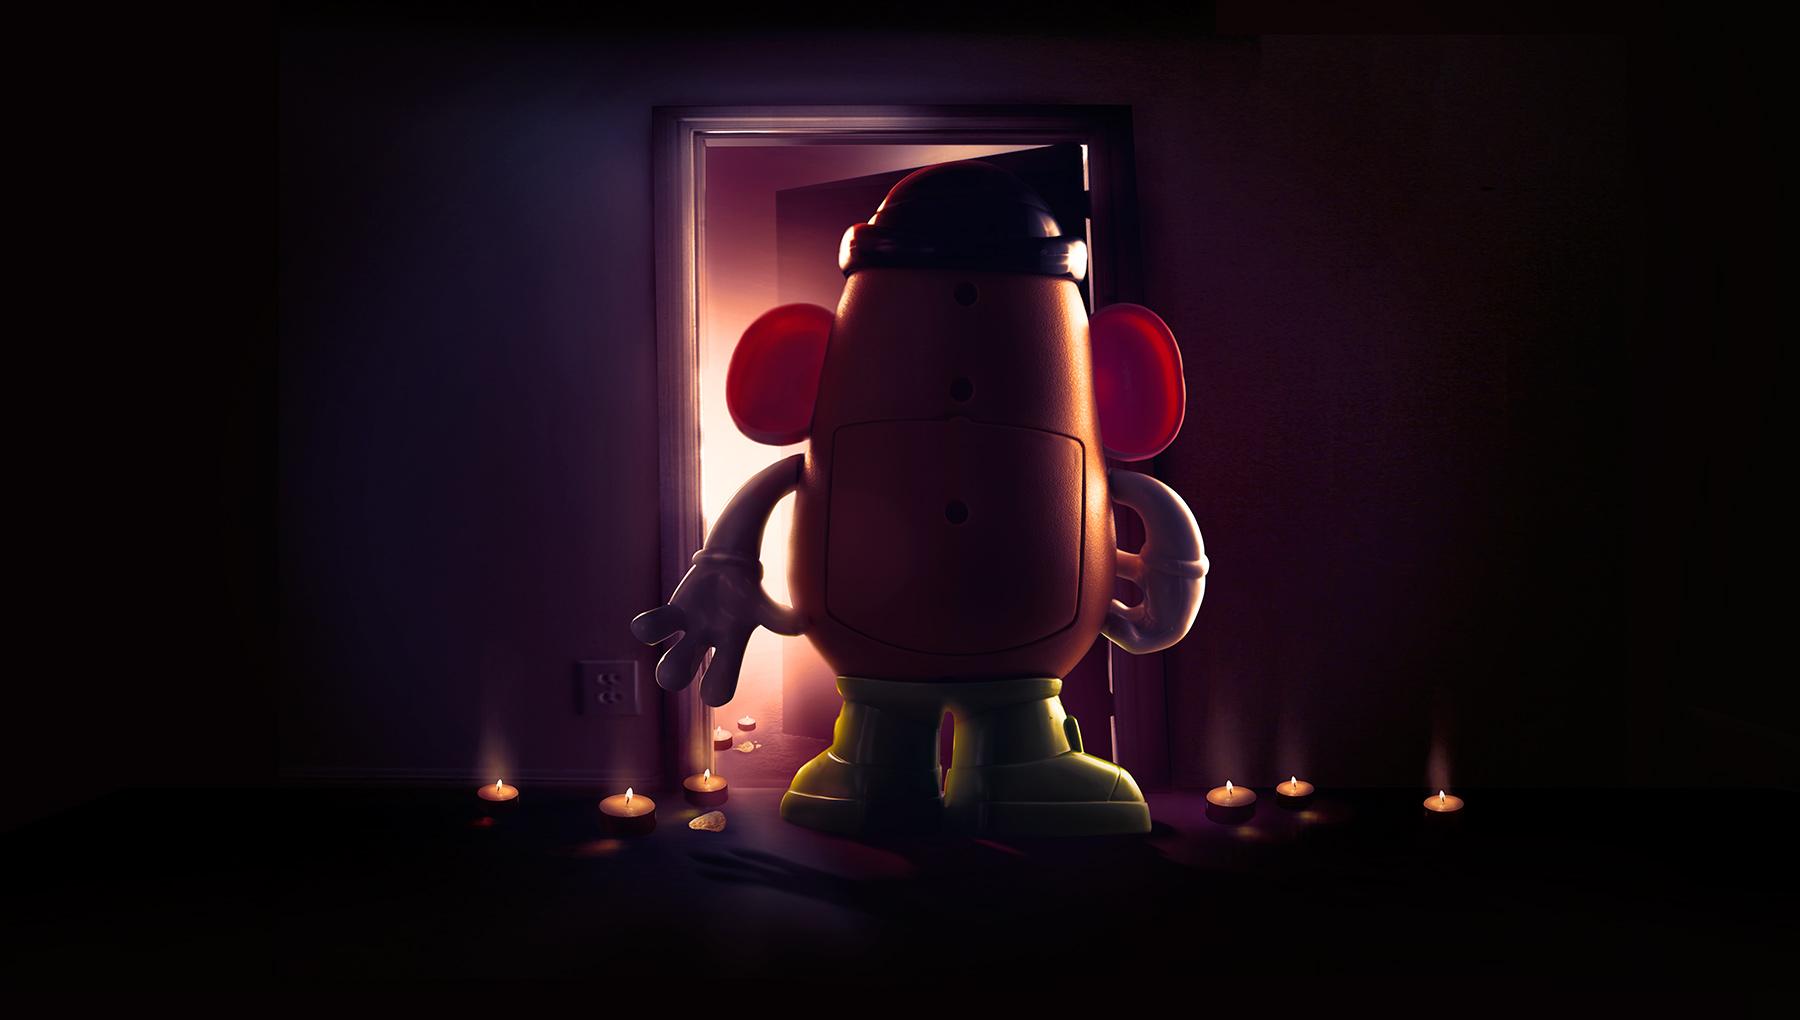 LaurenIndovina-Lays-HorrorFilm-Potatohead.jpg